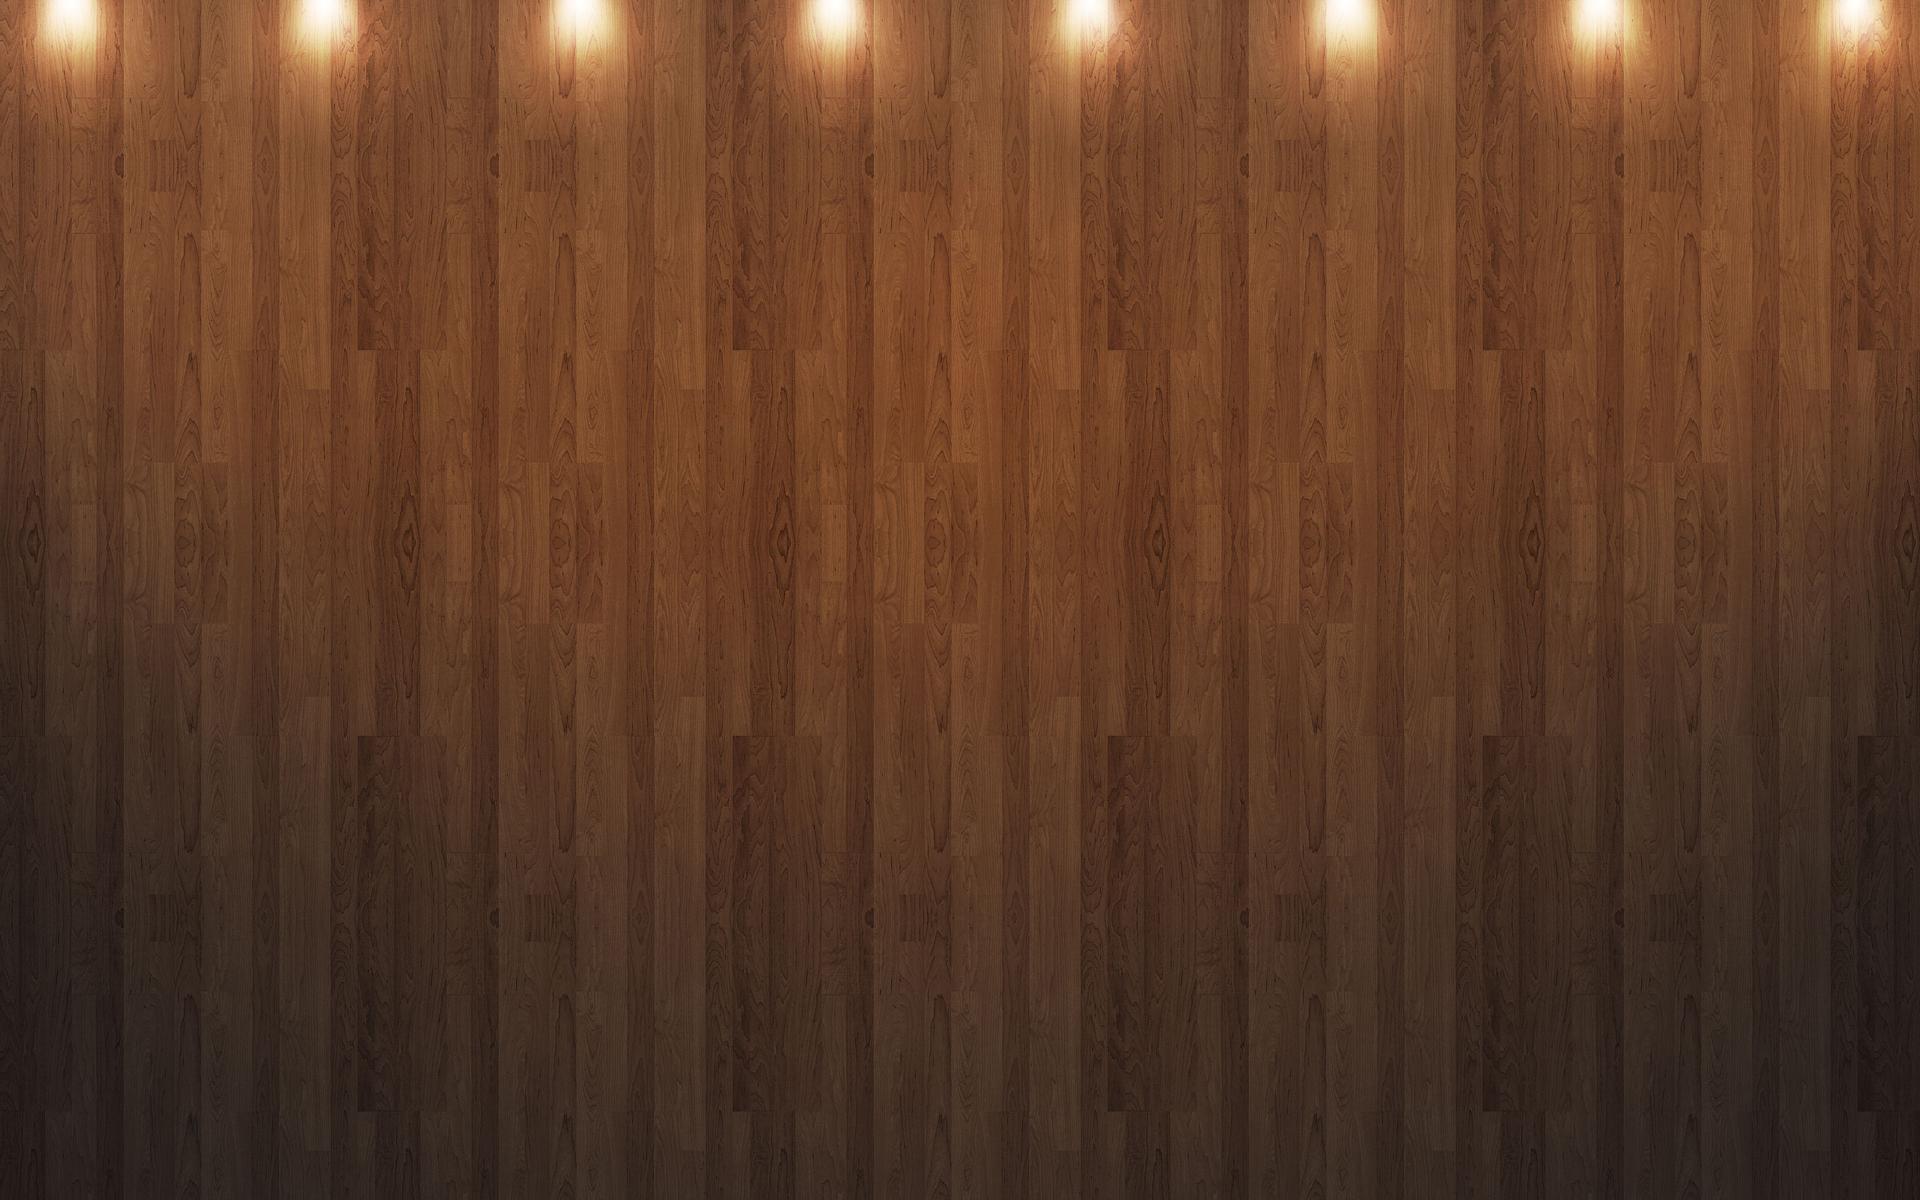 wallpapers backgrounds popular wallpaper filter wood lights 1920x1200